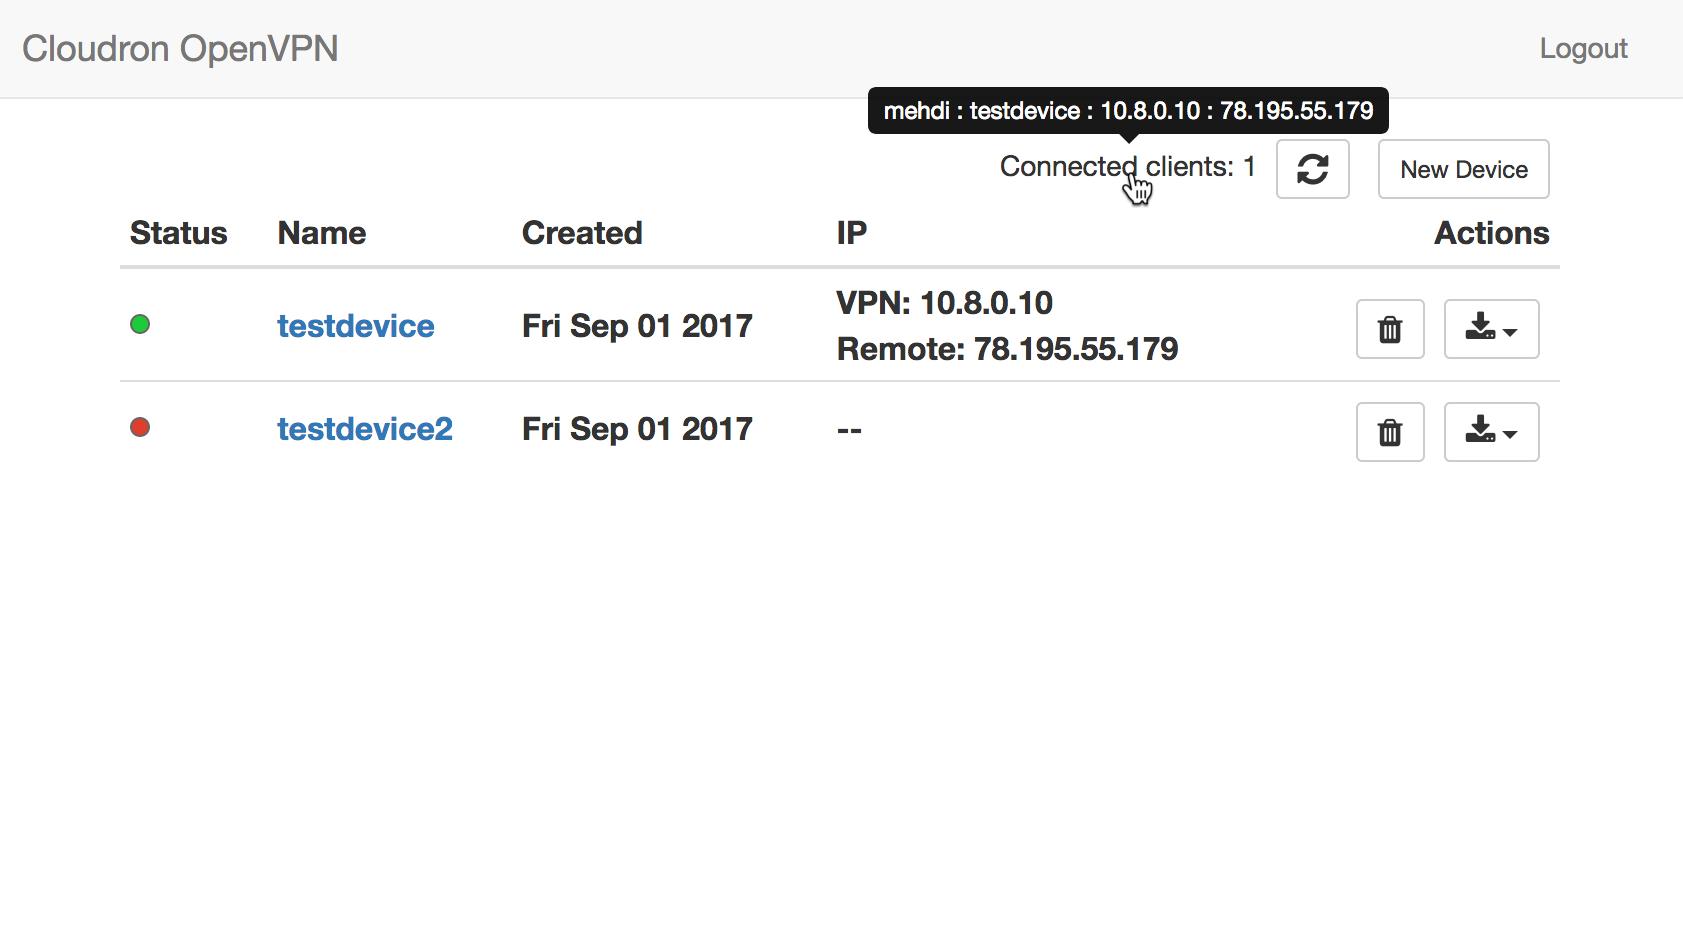 OpenVPN Screenshot 2